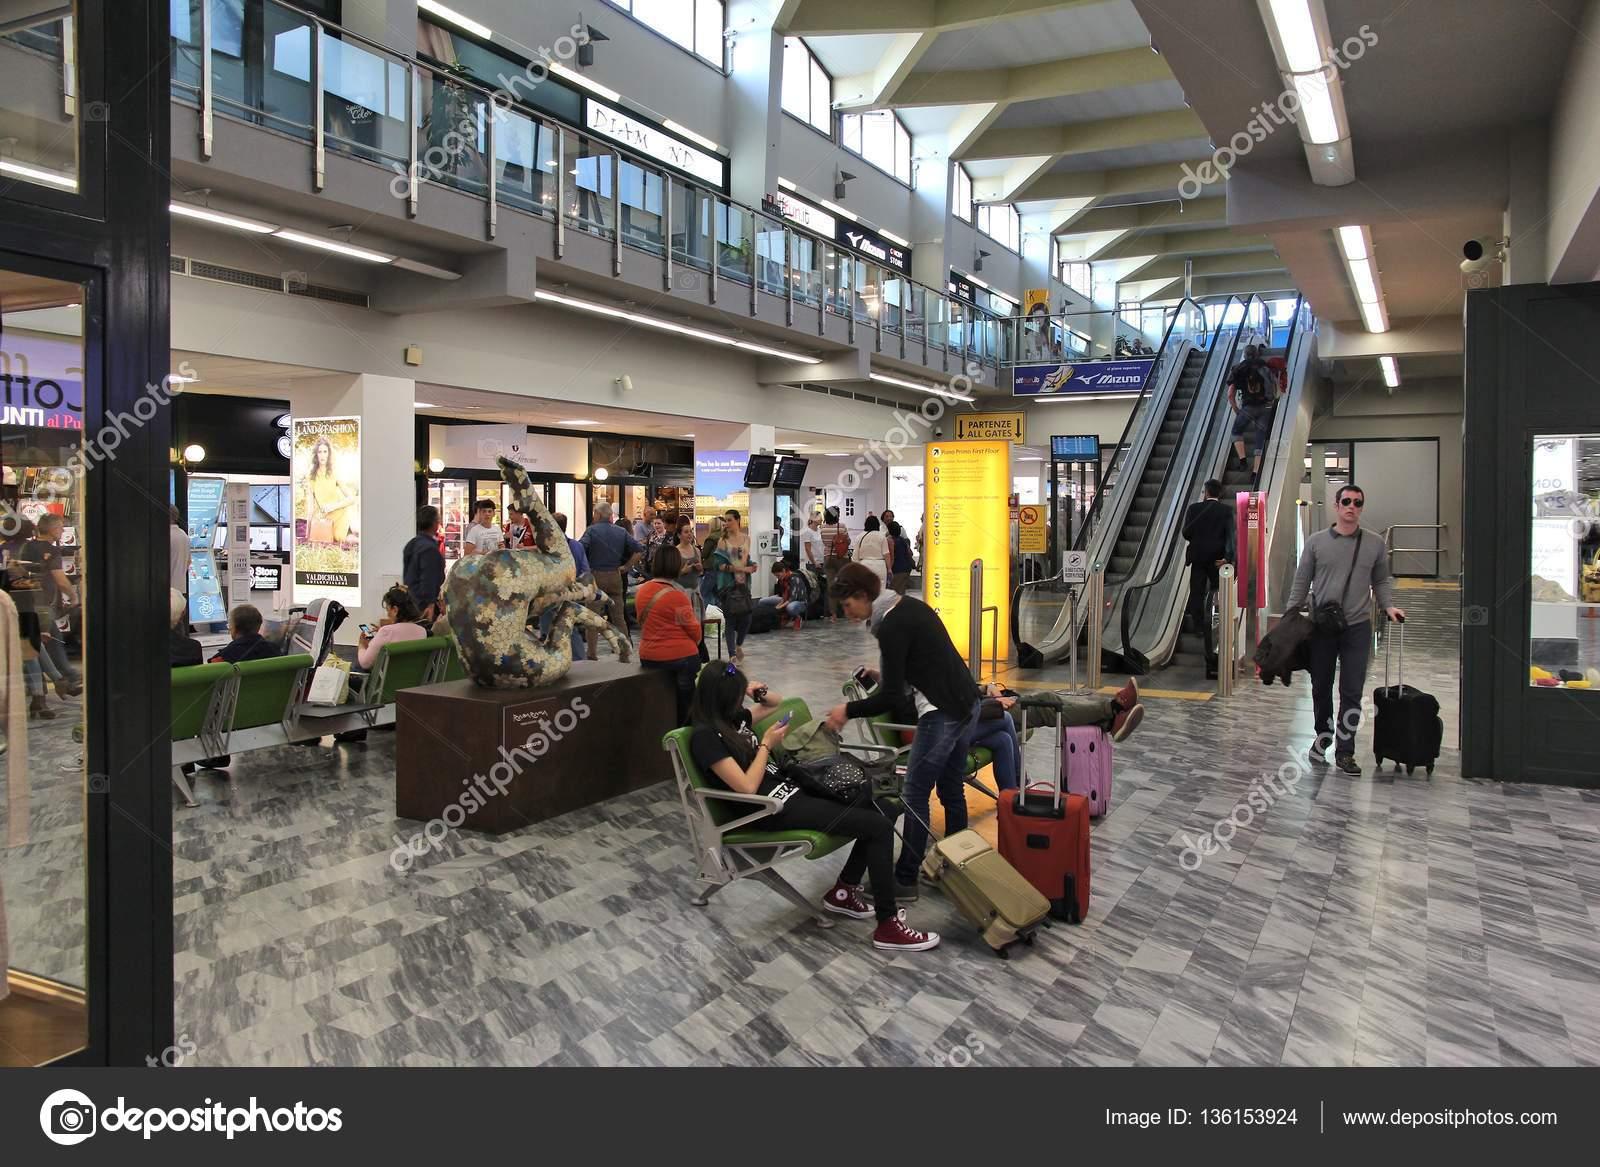 Aeroporto Pisa : Aeroporto pisa galileo galilei retail food u edifis spu flickr